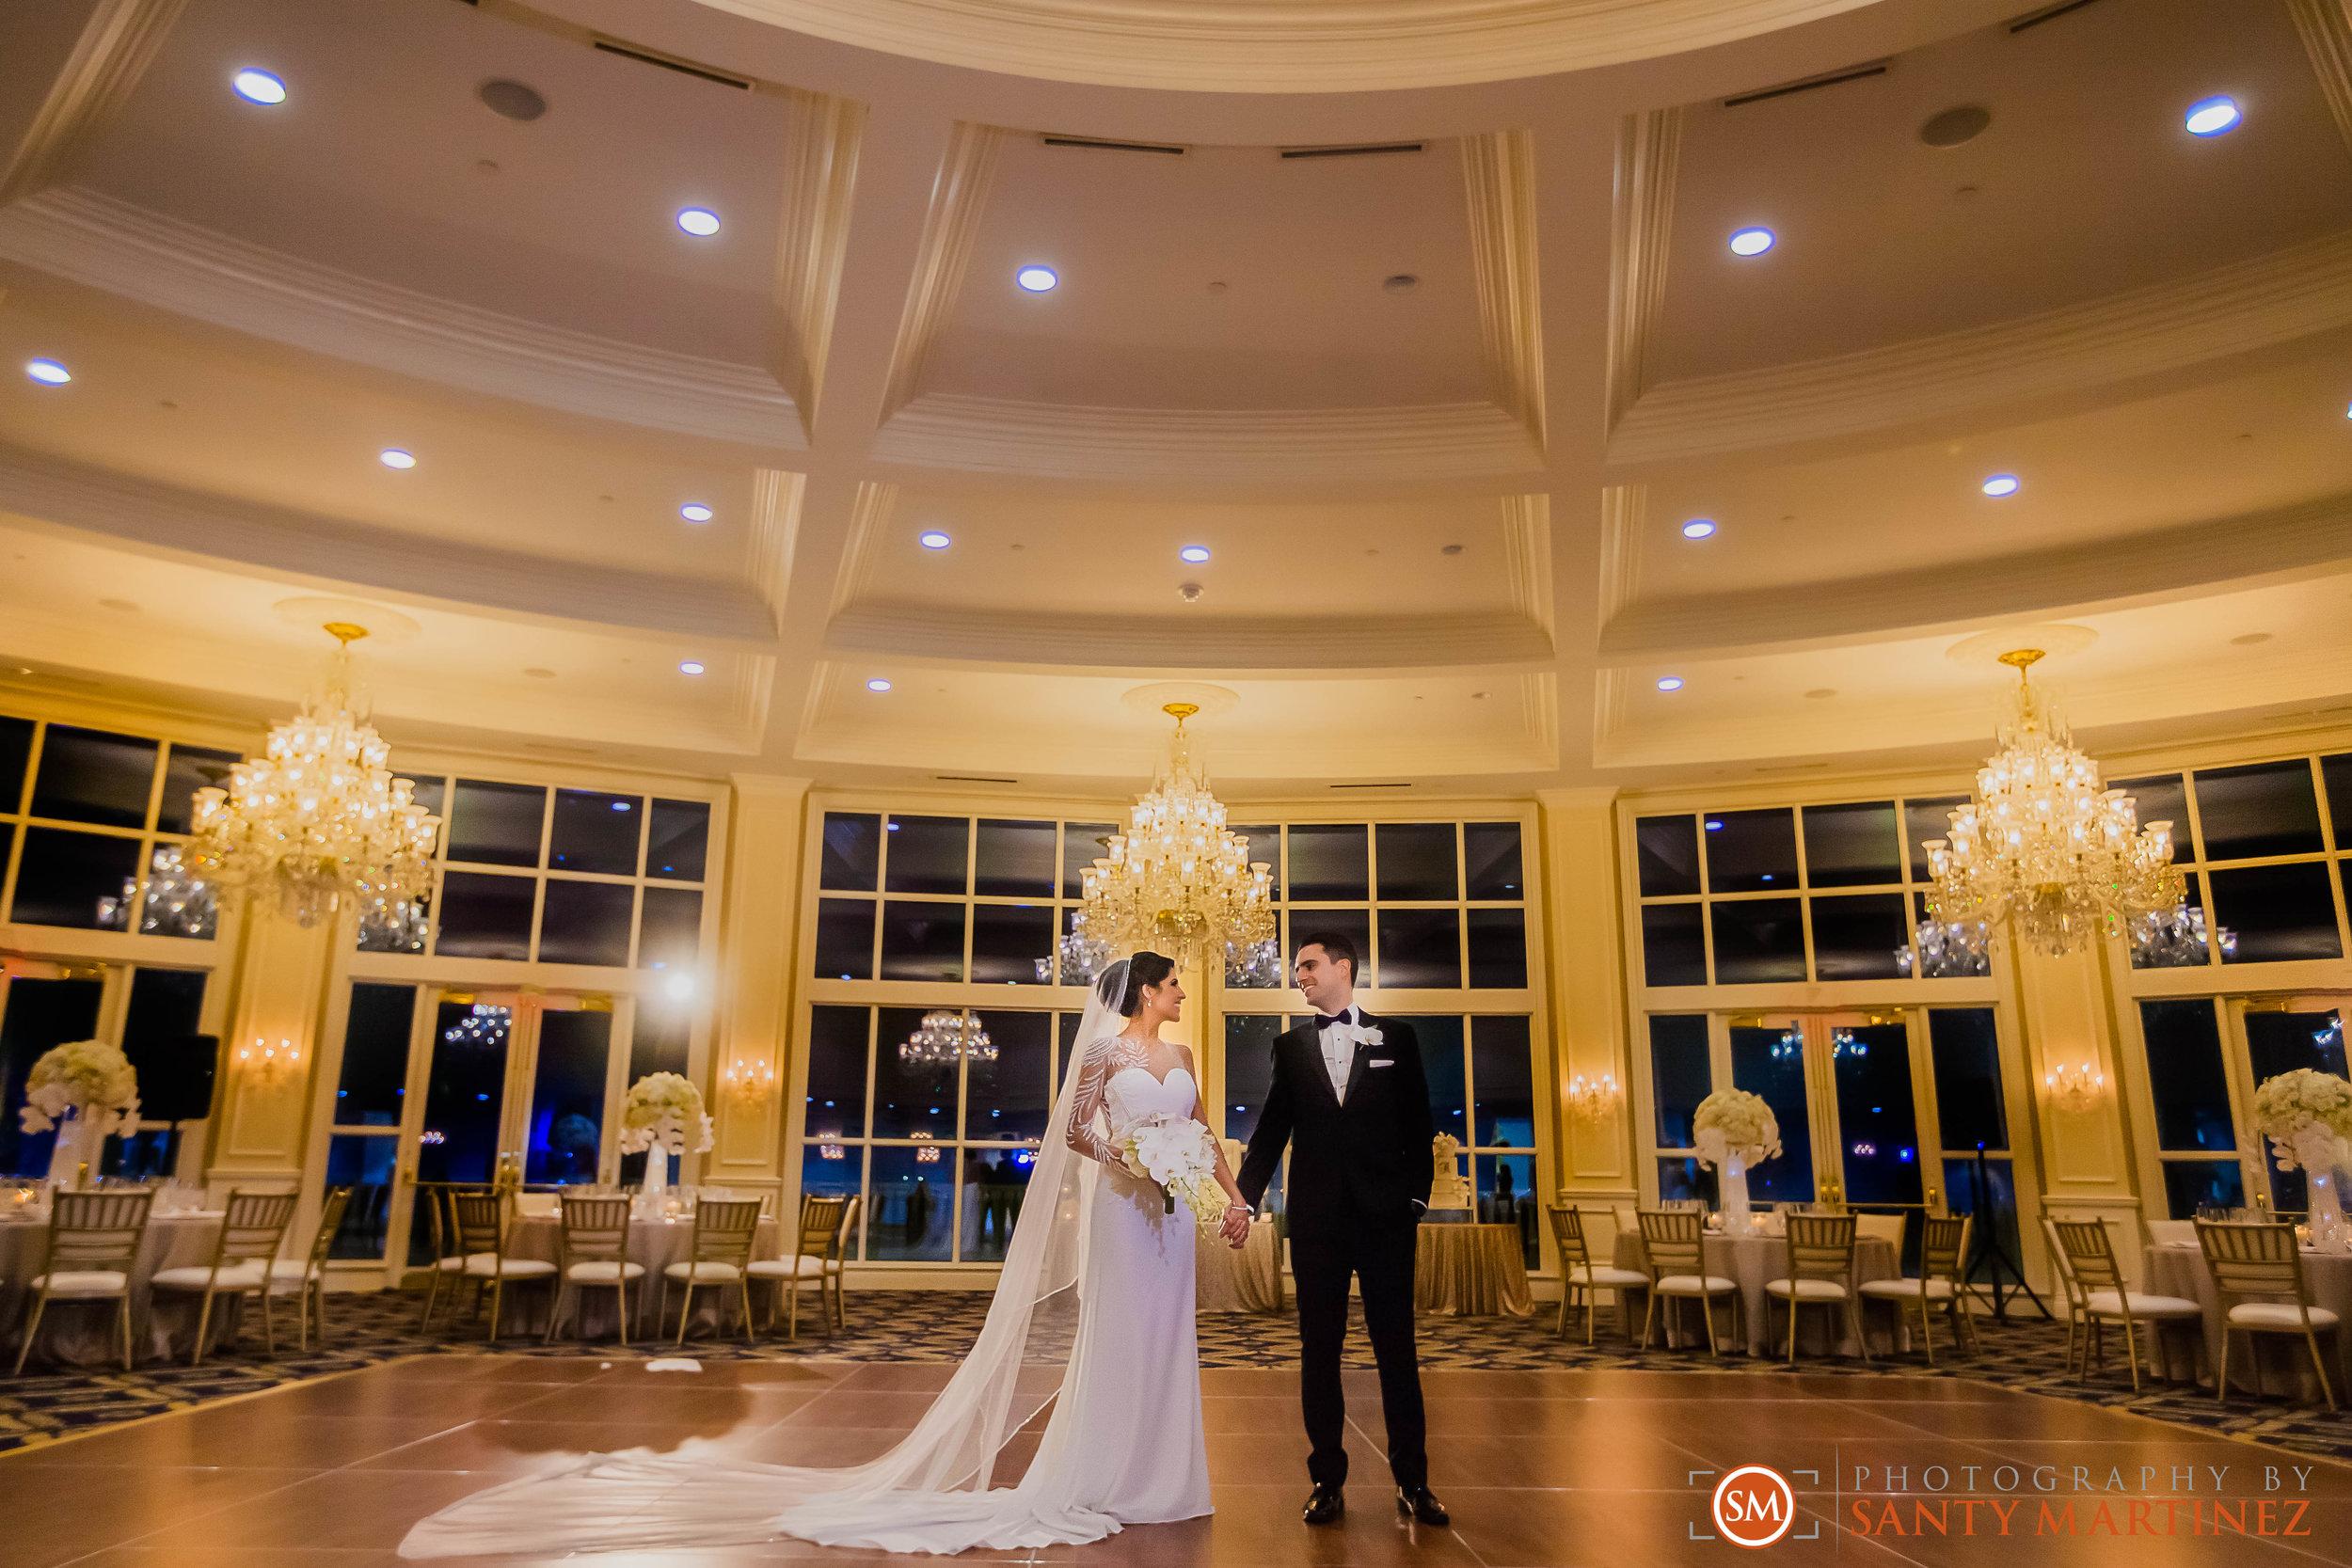 Wedding Trump National Doral Miami - Photography by Santy Martinez-24.jpg